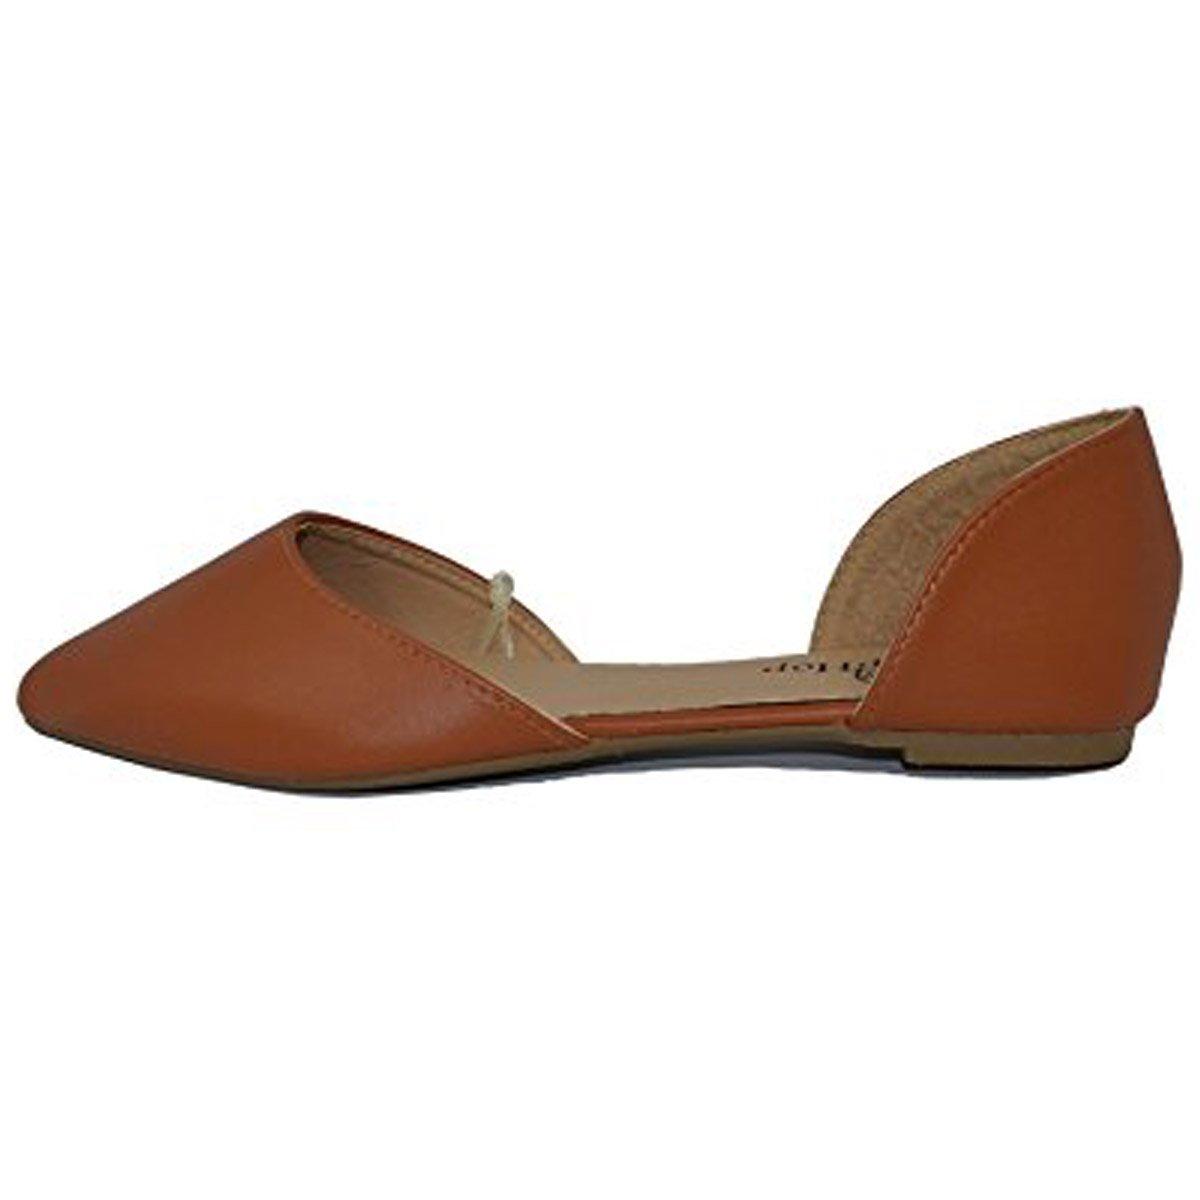 Kyle Walsh Pa Women Pointed Toe Slip On Ballet Flats Heel Shoes Khaki